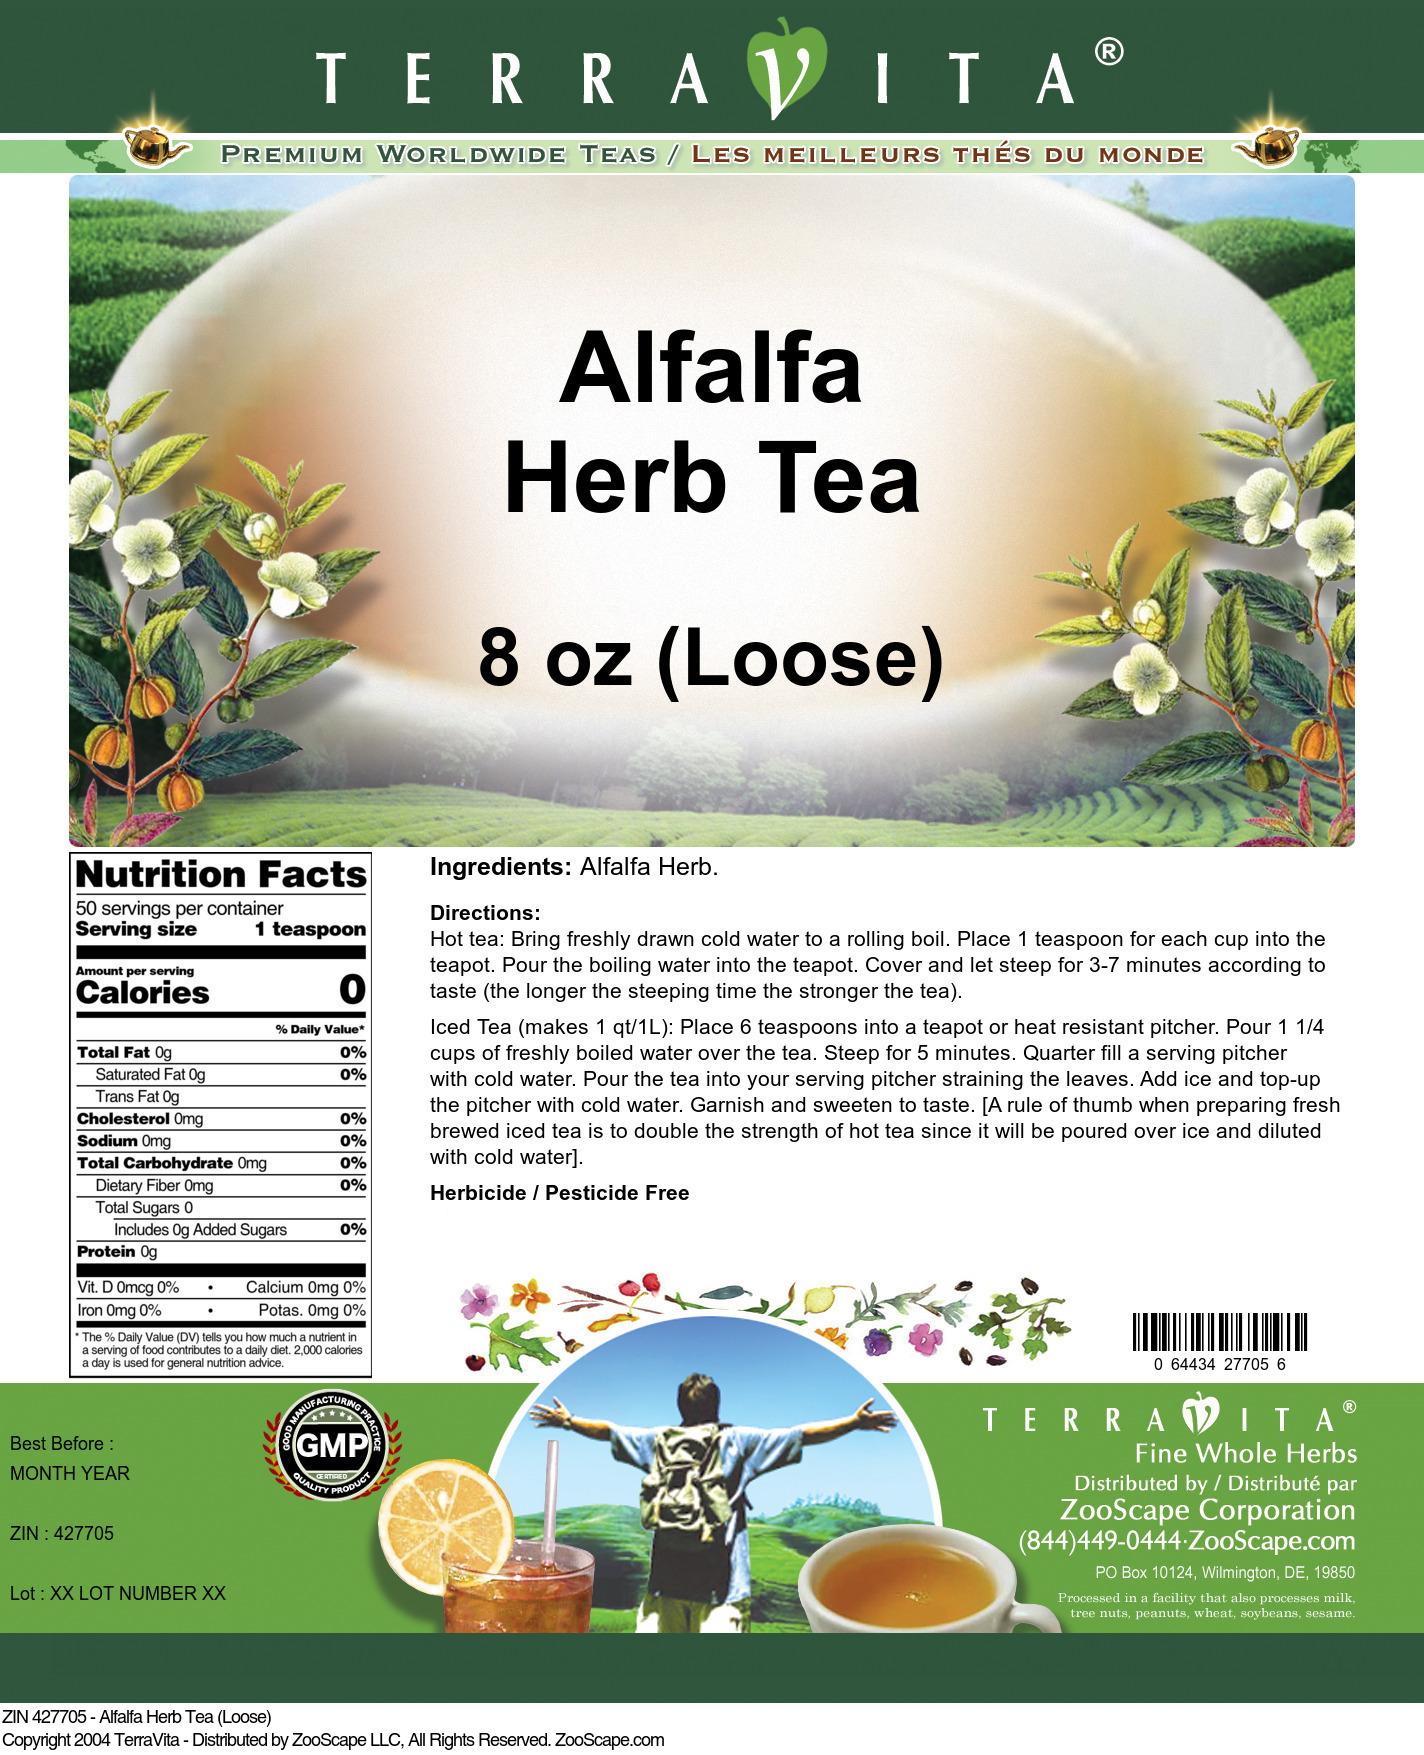 Alfalfa Herb Tea (Loose)